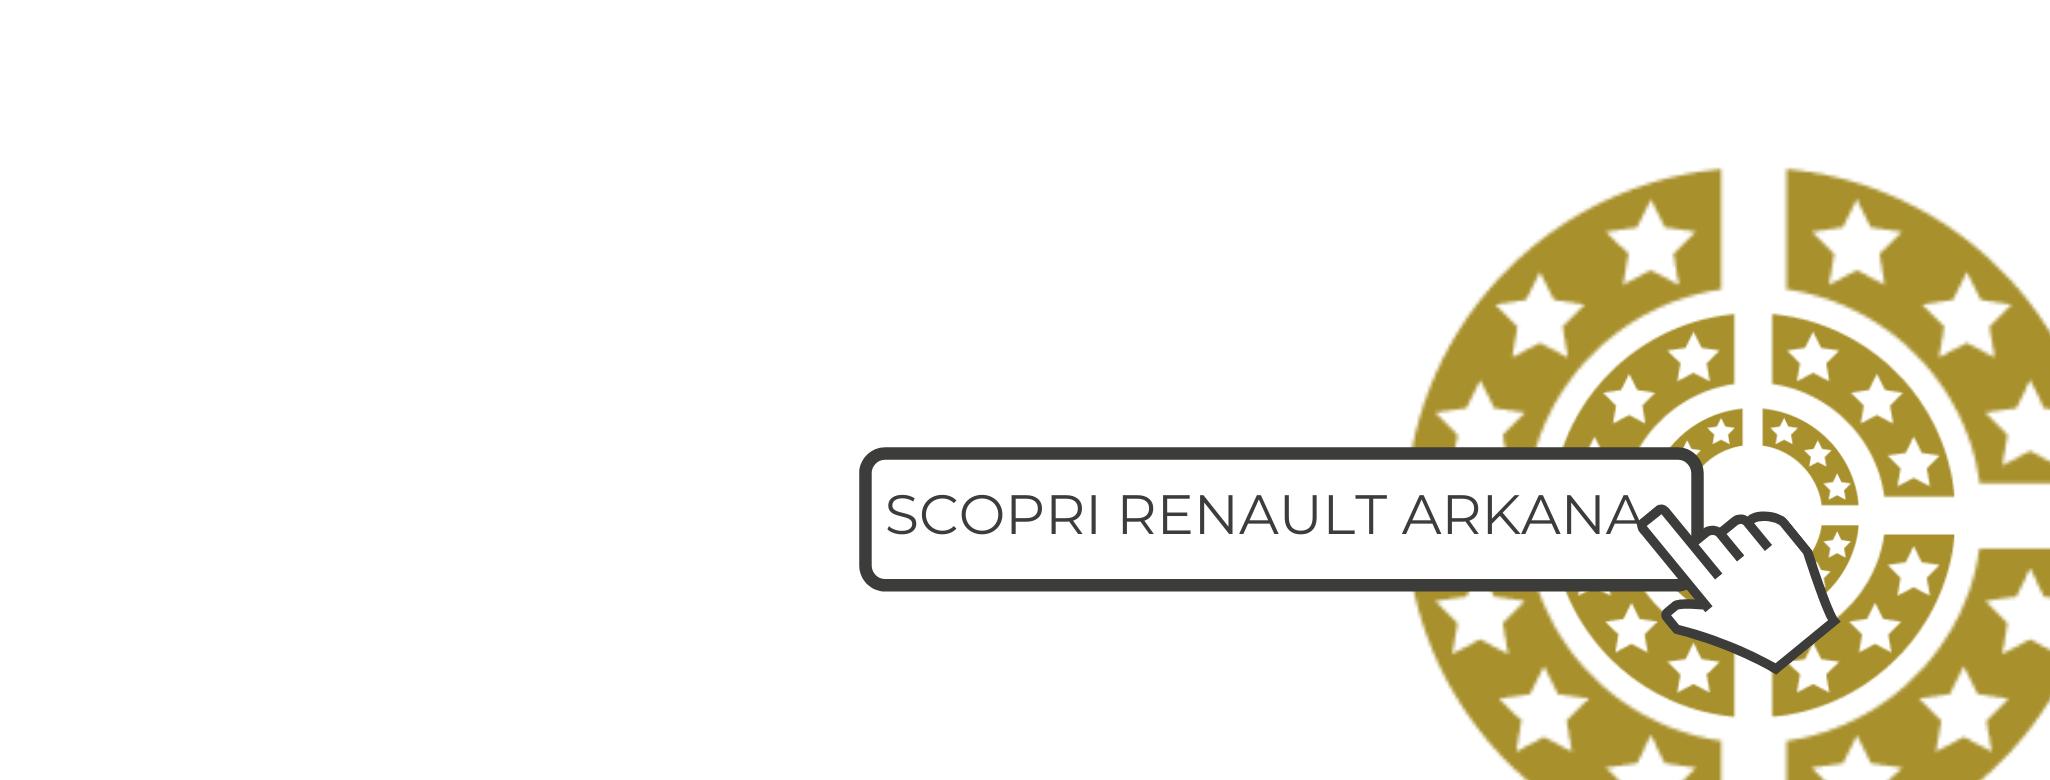 Scopri Renault Arkana